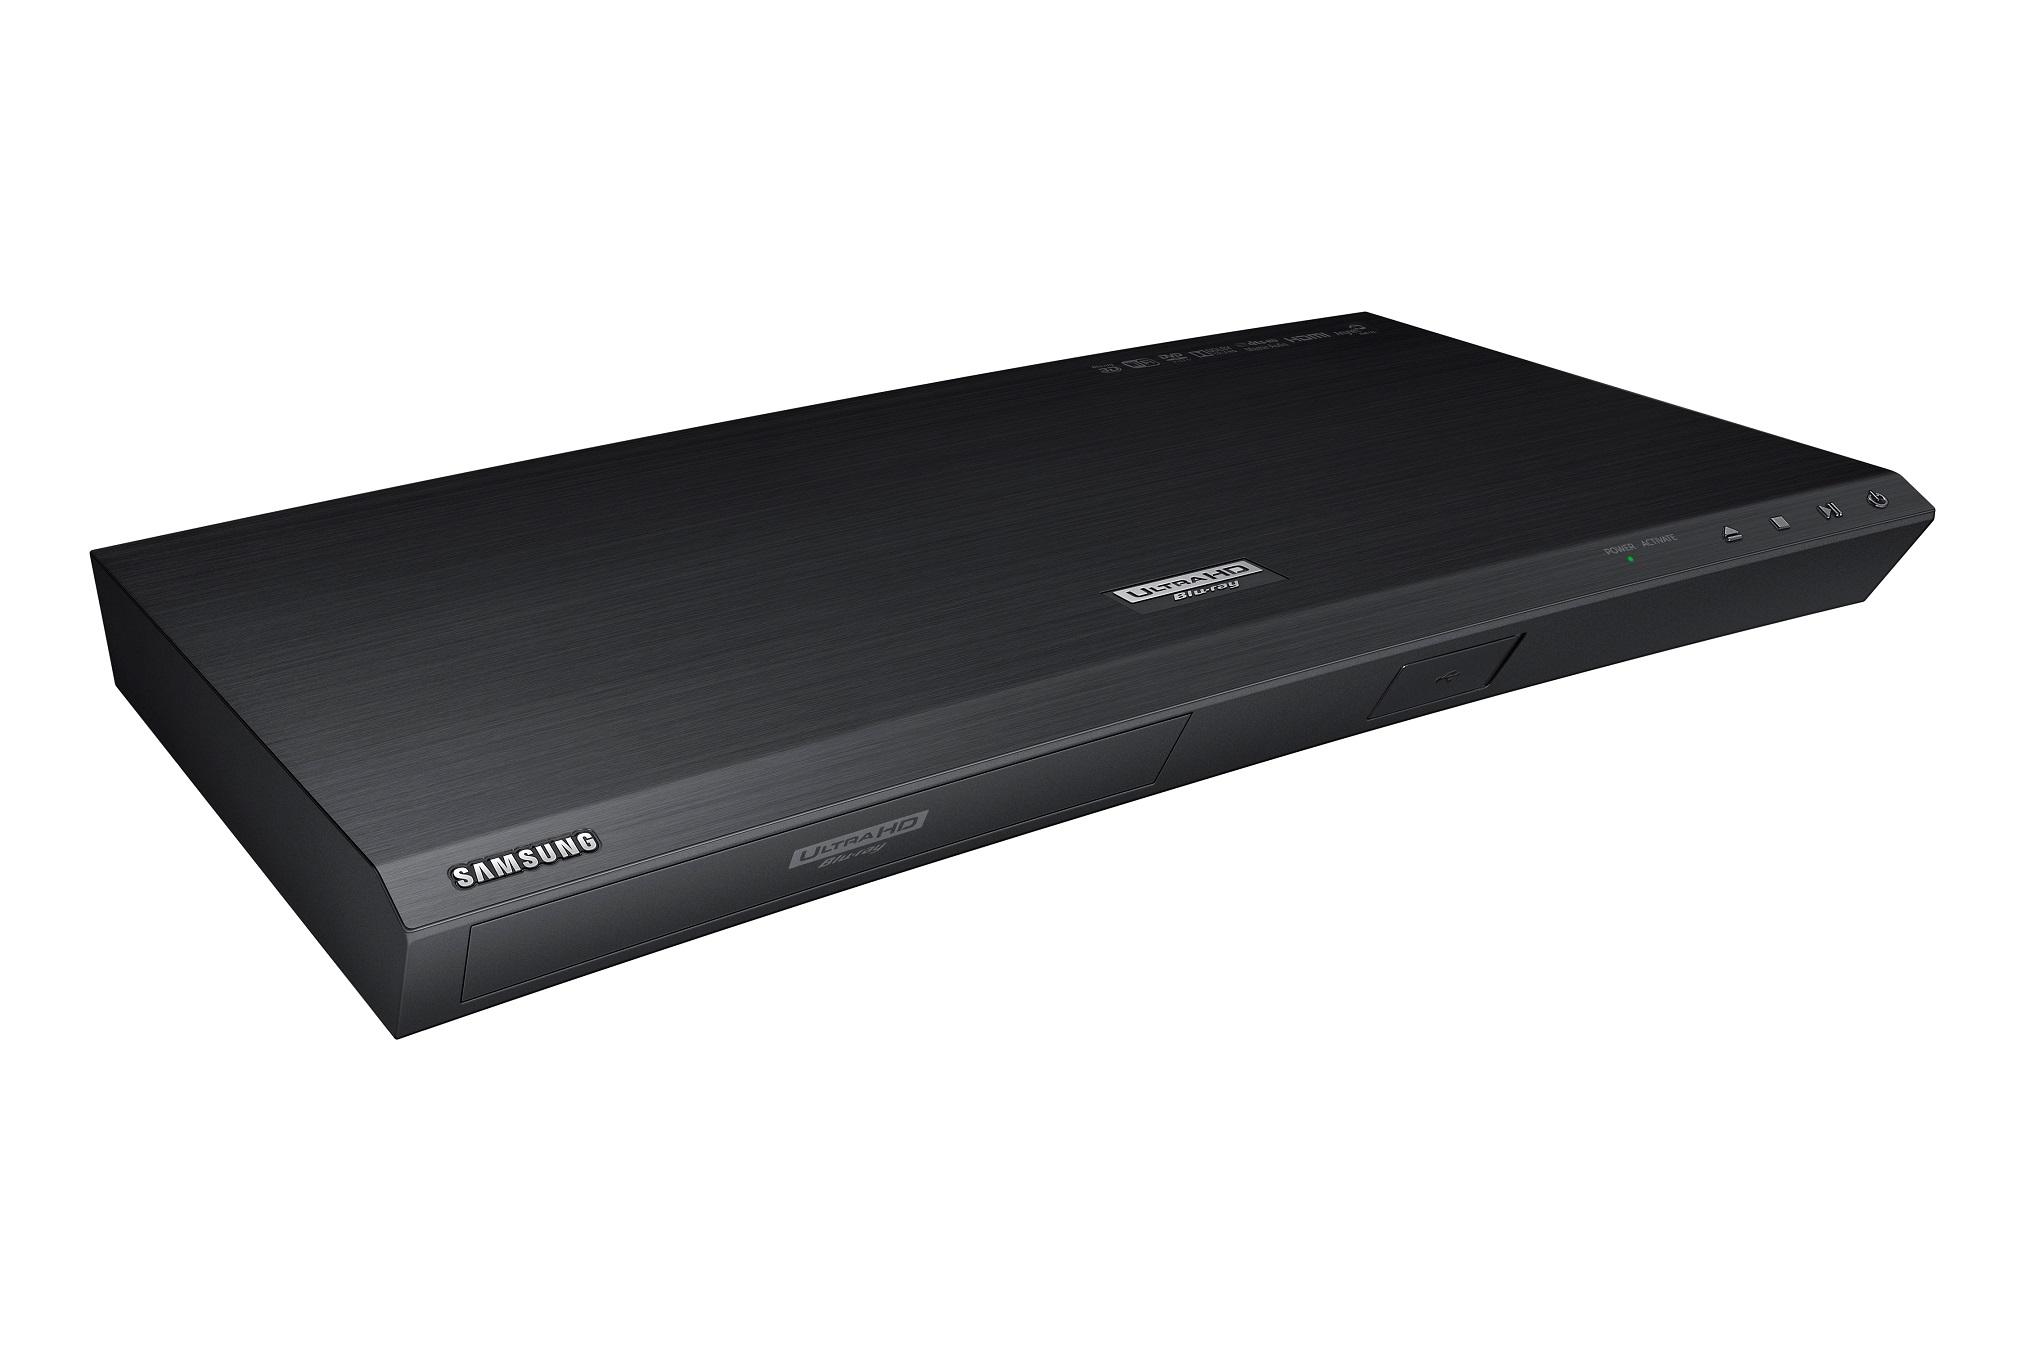 UBD-K8500_Dynamic_Black